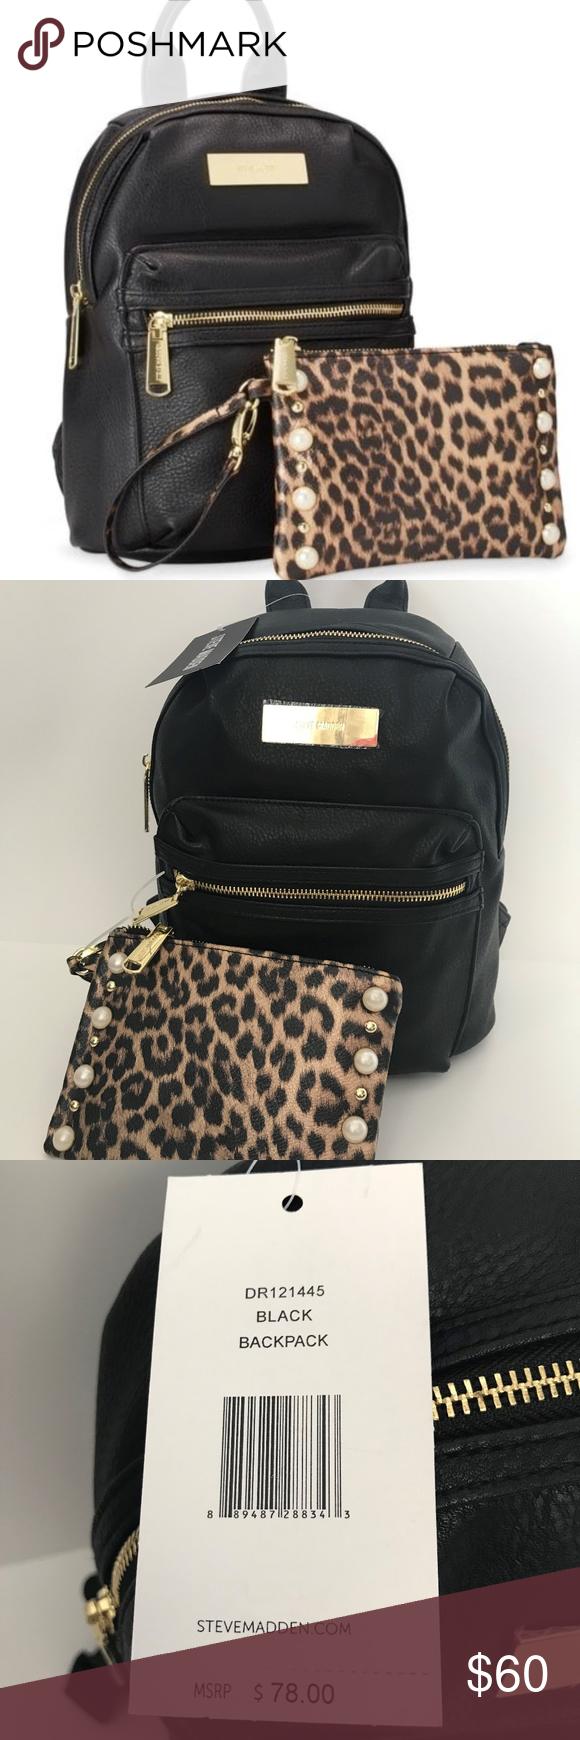 70ec2f9d398c2 Steve Madden Black BKris Mini Backpack and Bag Steve Madden BKris Mini  Fashion Backpack w